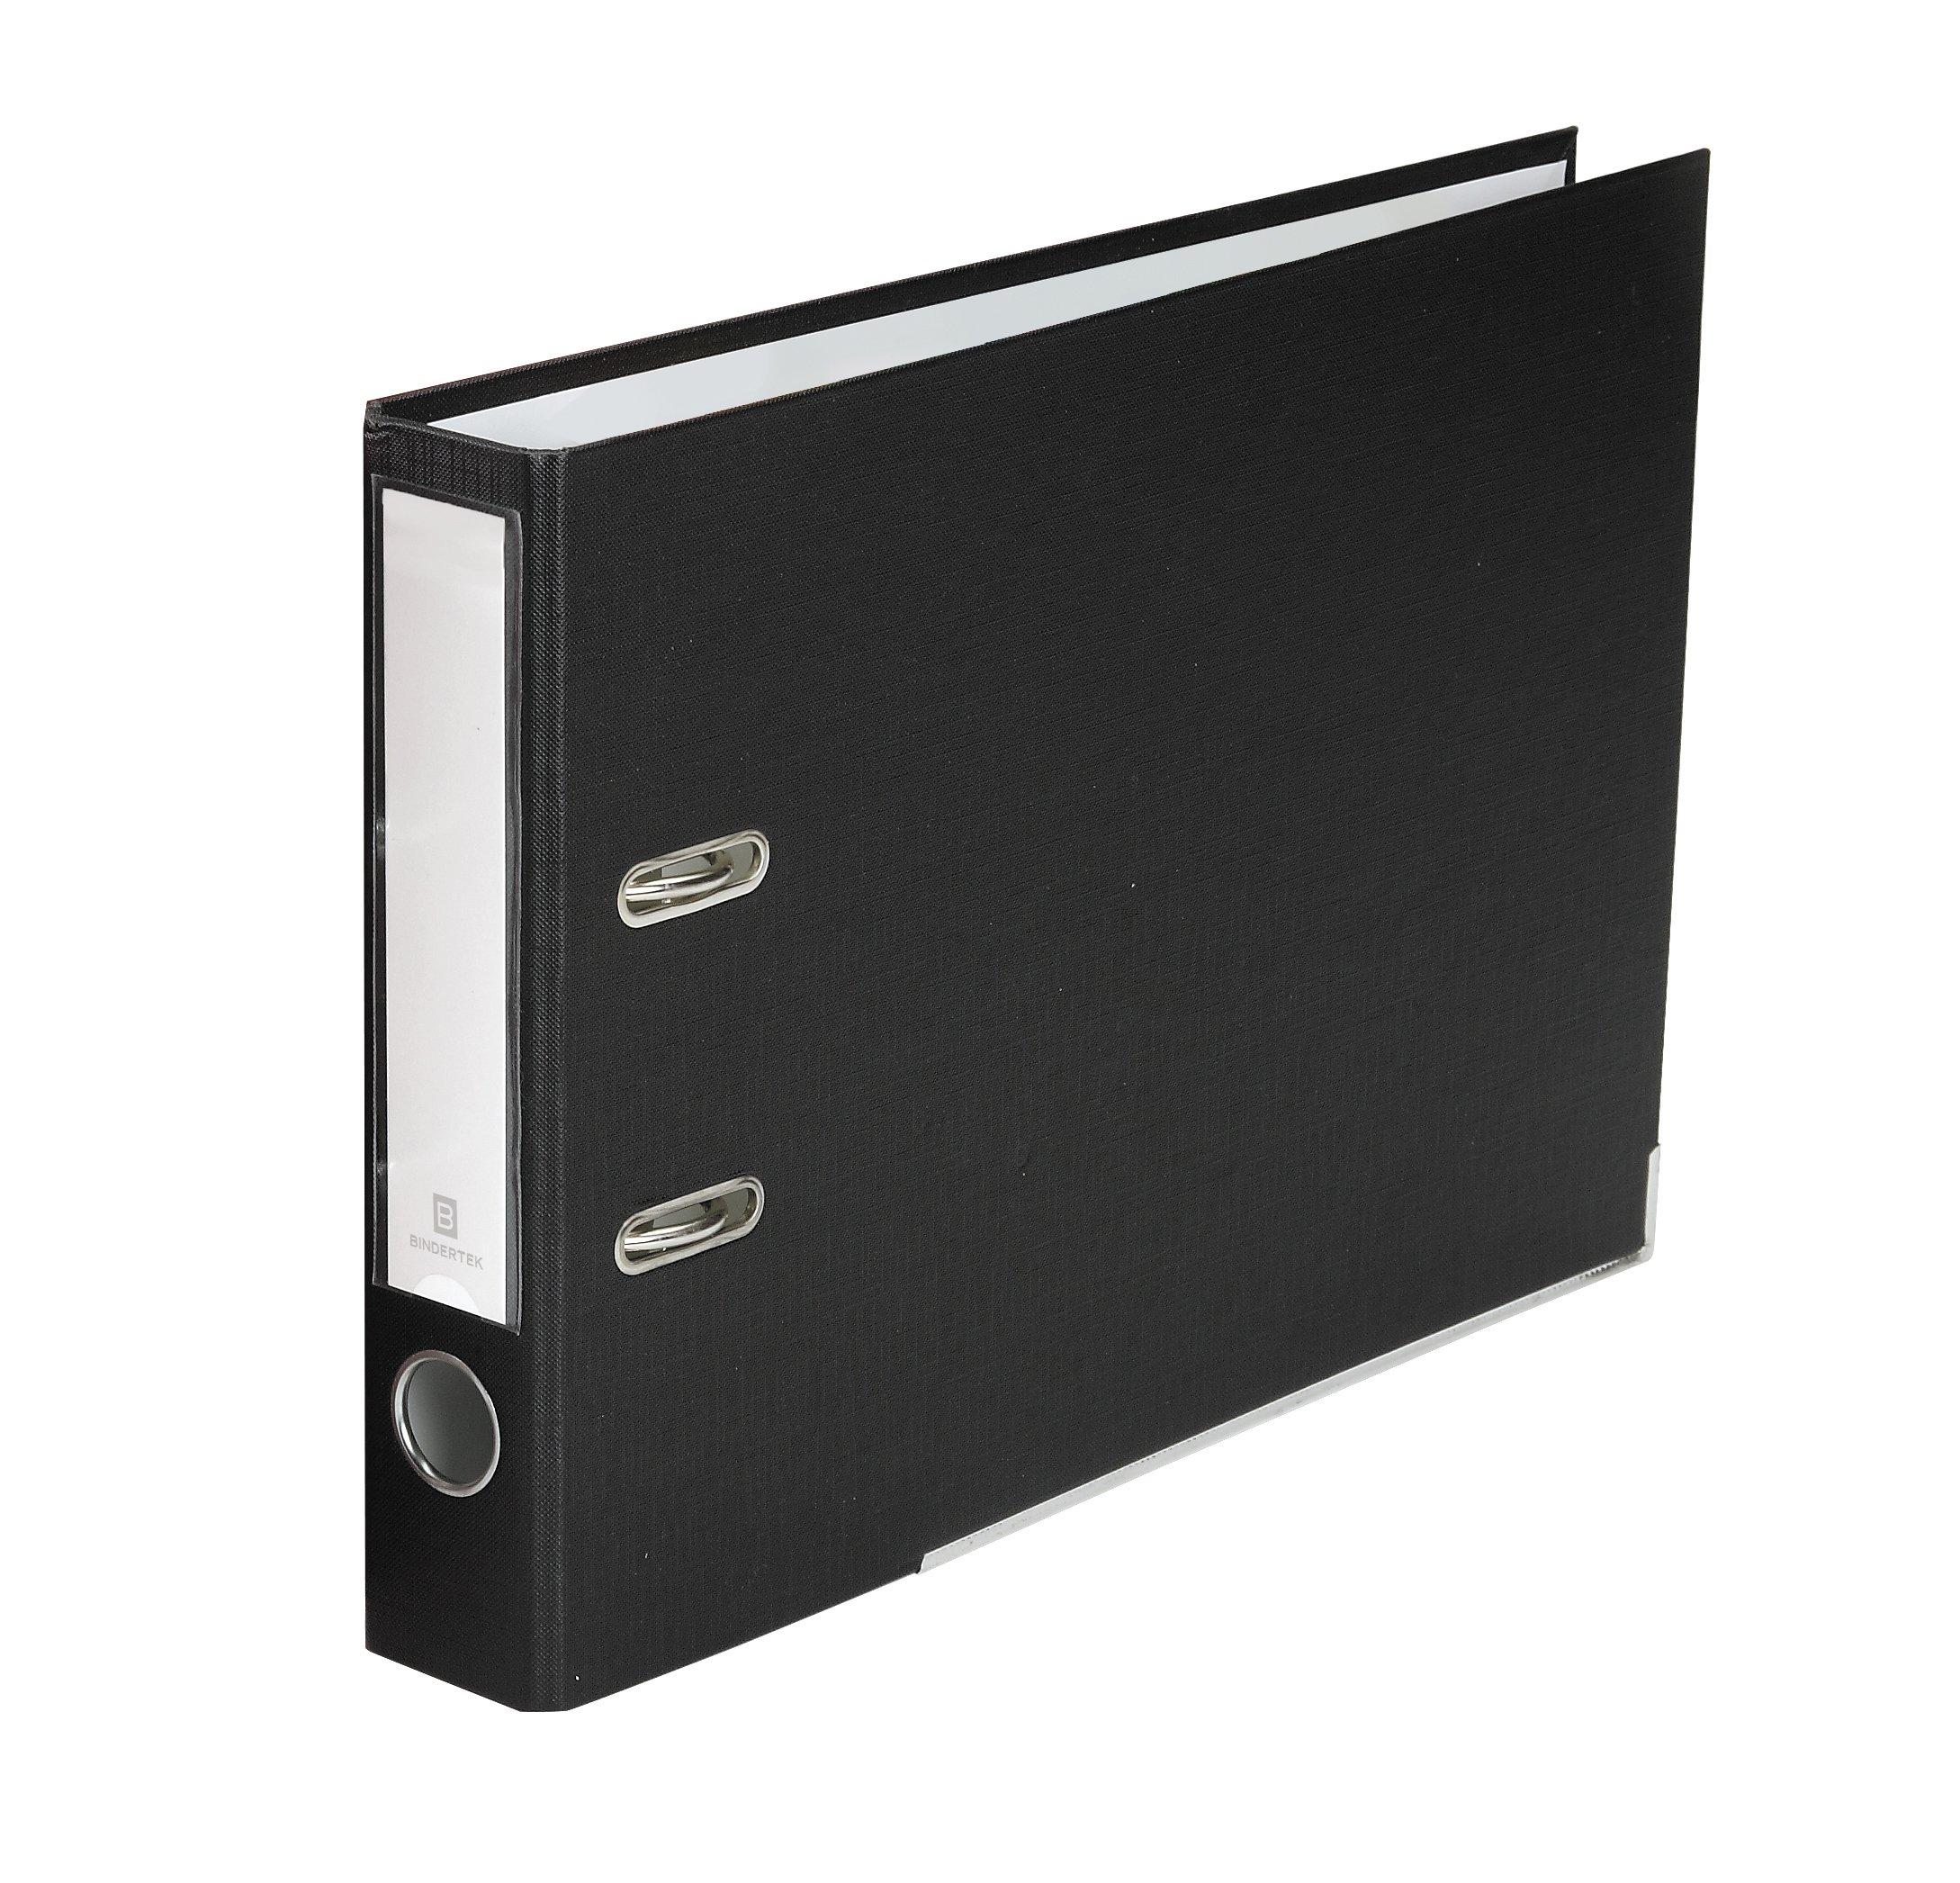 Bindertek 2-Ring 2-Inch Premium Top File Binders, For Top-Punched Paper, Black (TFSLN-BK)